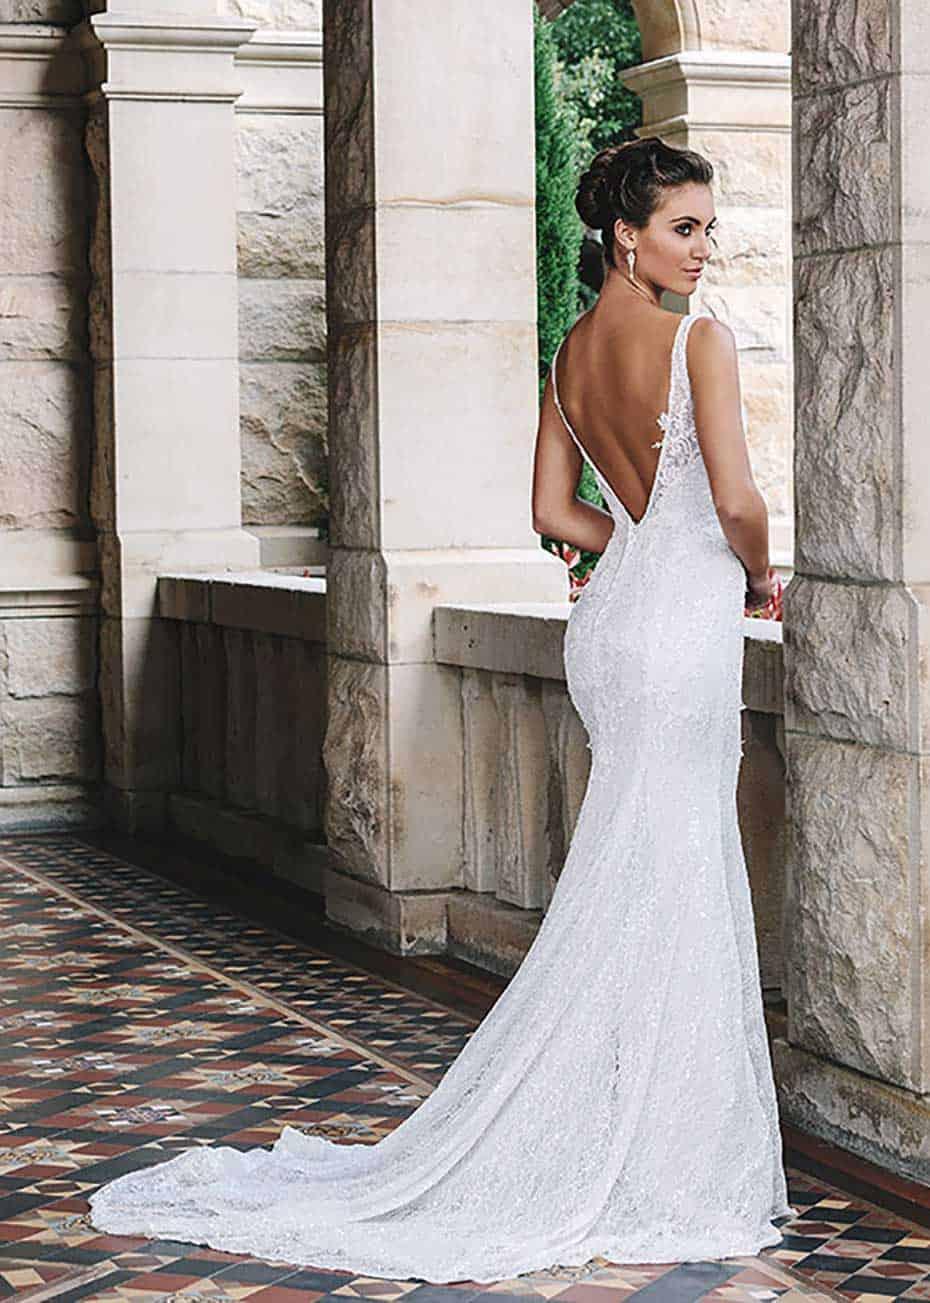 V Back lace wedding dress from Jack Sullivan Bridal.